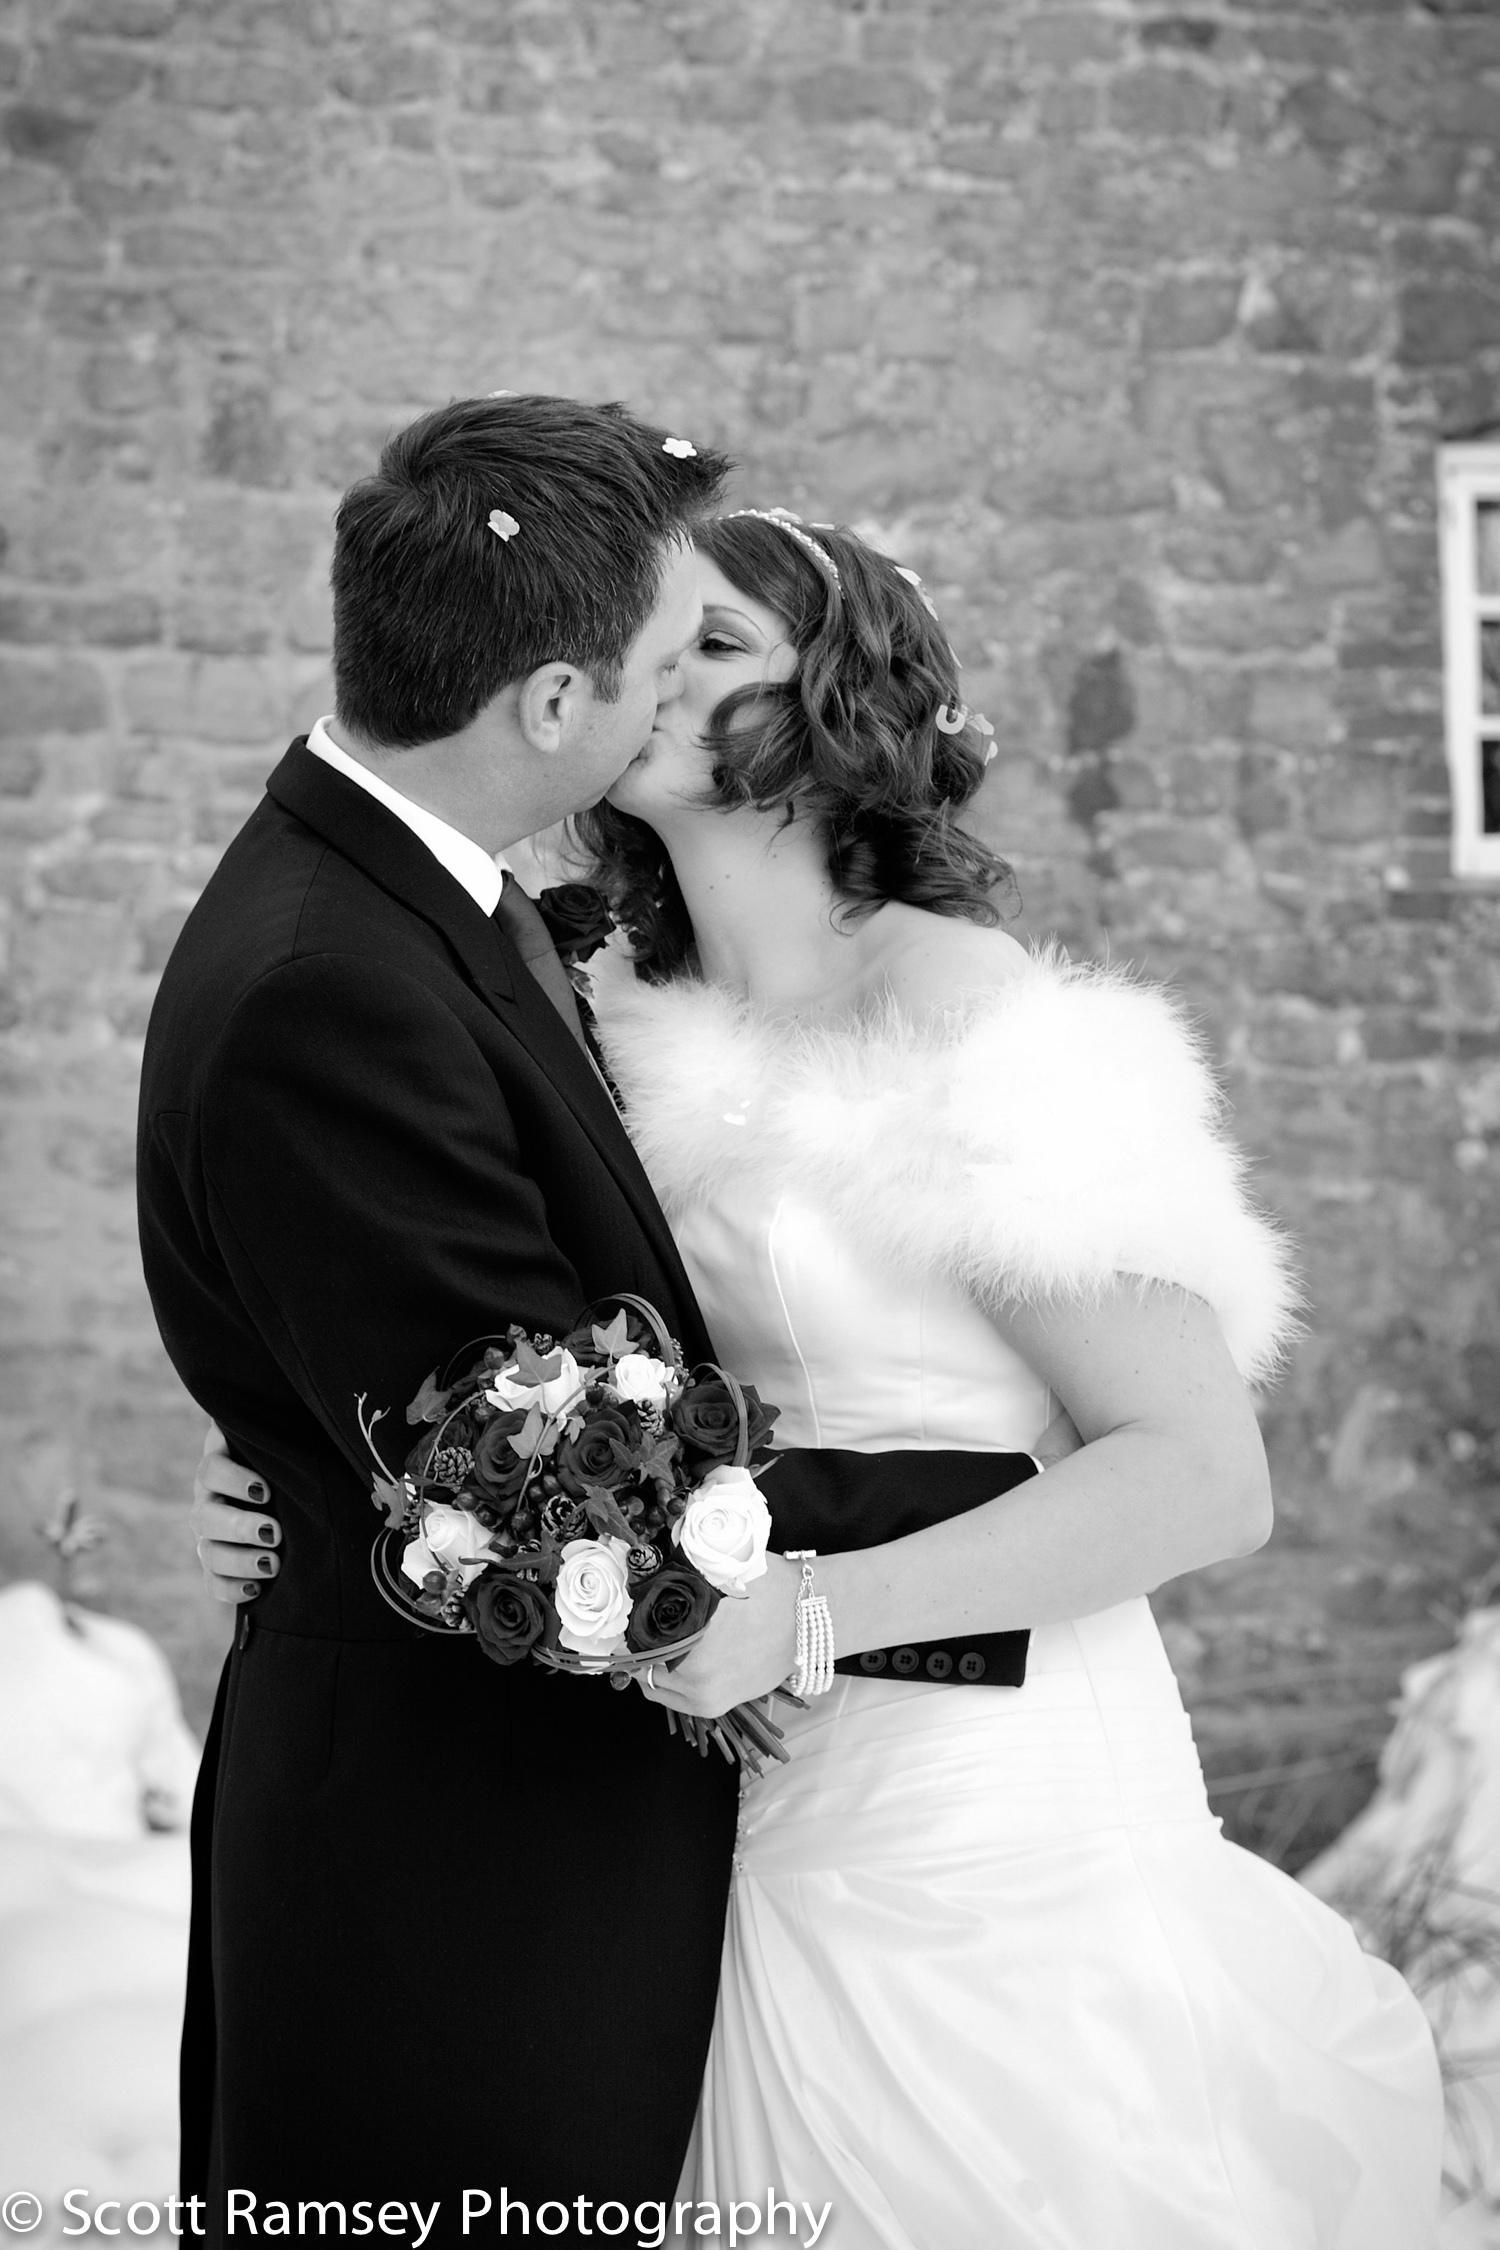 Winter-Wedding-Spread-Eagle-Hotel-Midhurst-Bride-Groom-Kiss-In-S